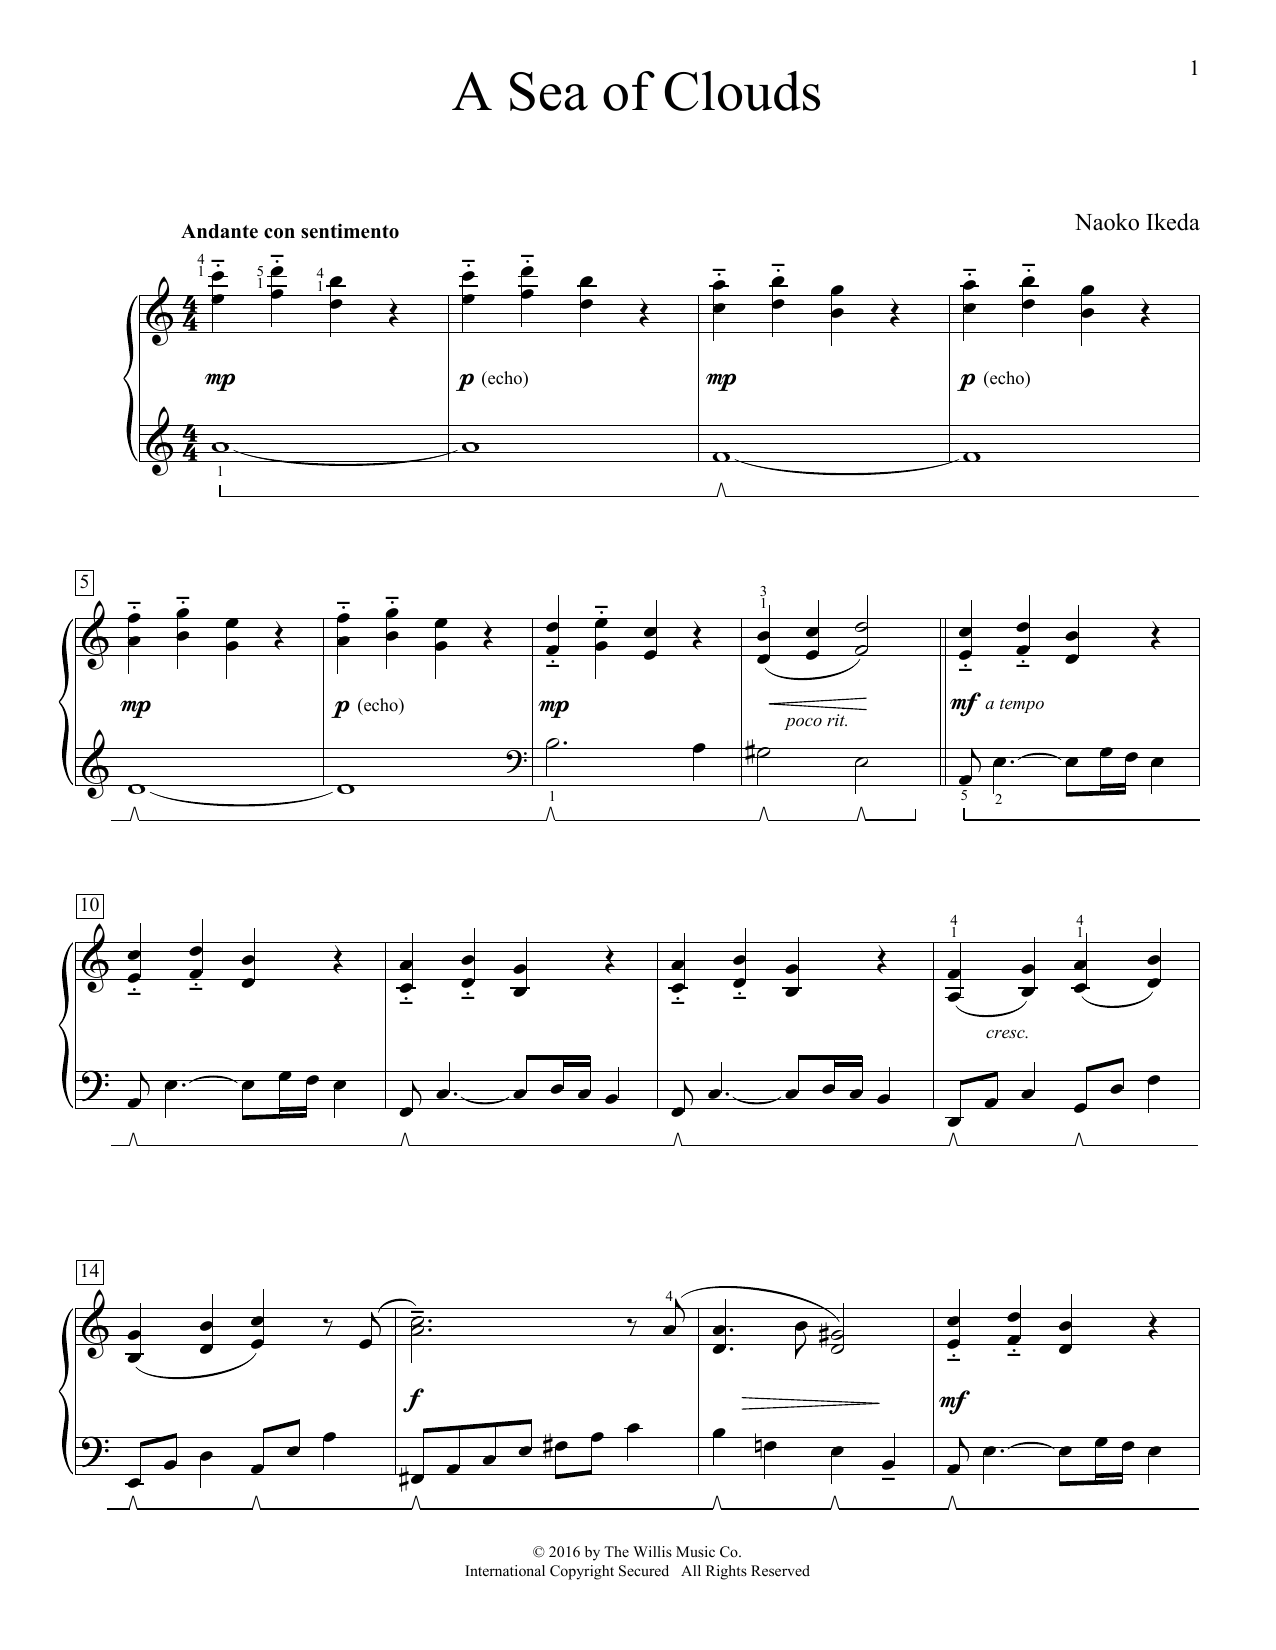 Naoko Ikeda A Sea Of Clouds sheet music notes and chords. Download Printable PDF.